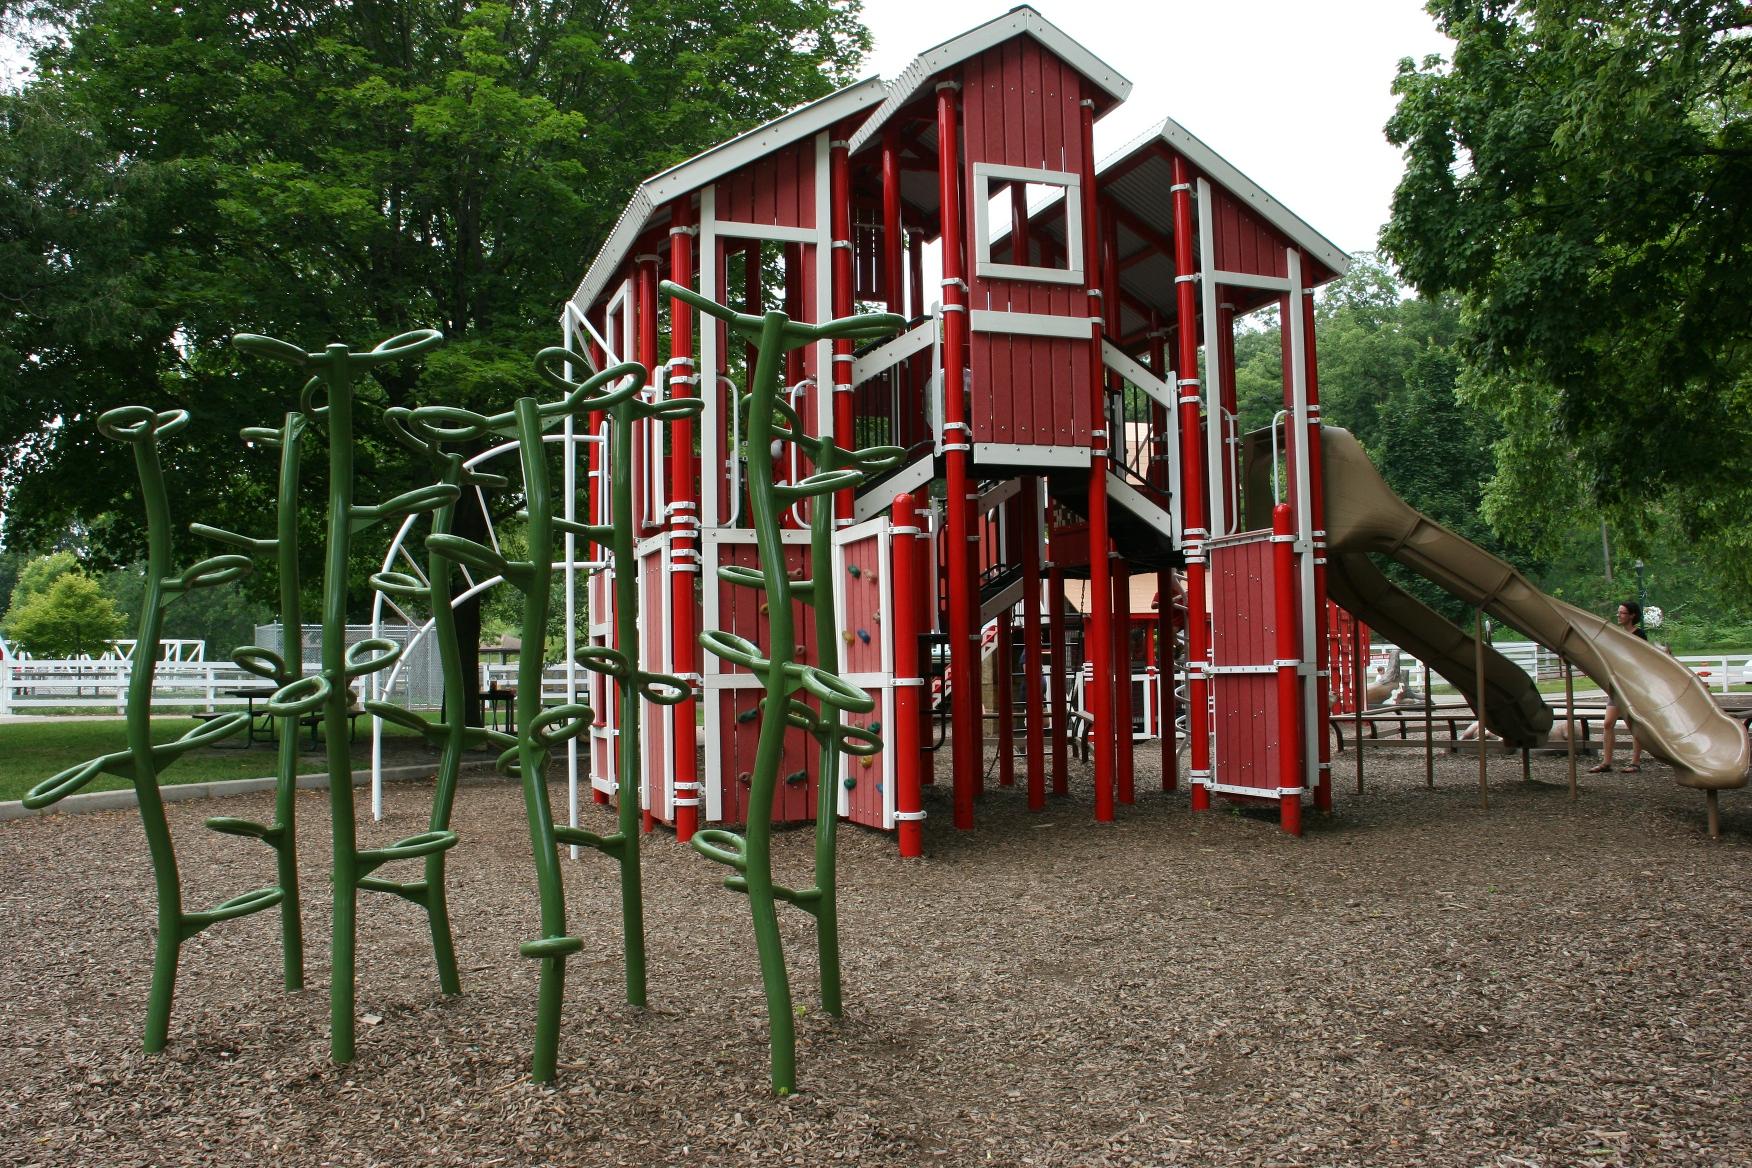 An old macdonald style park in mankato minnesota prairie for Playground equipment ideas